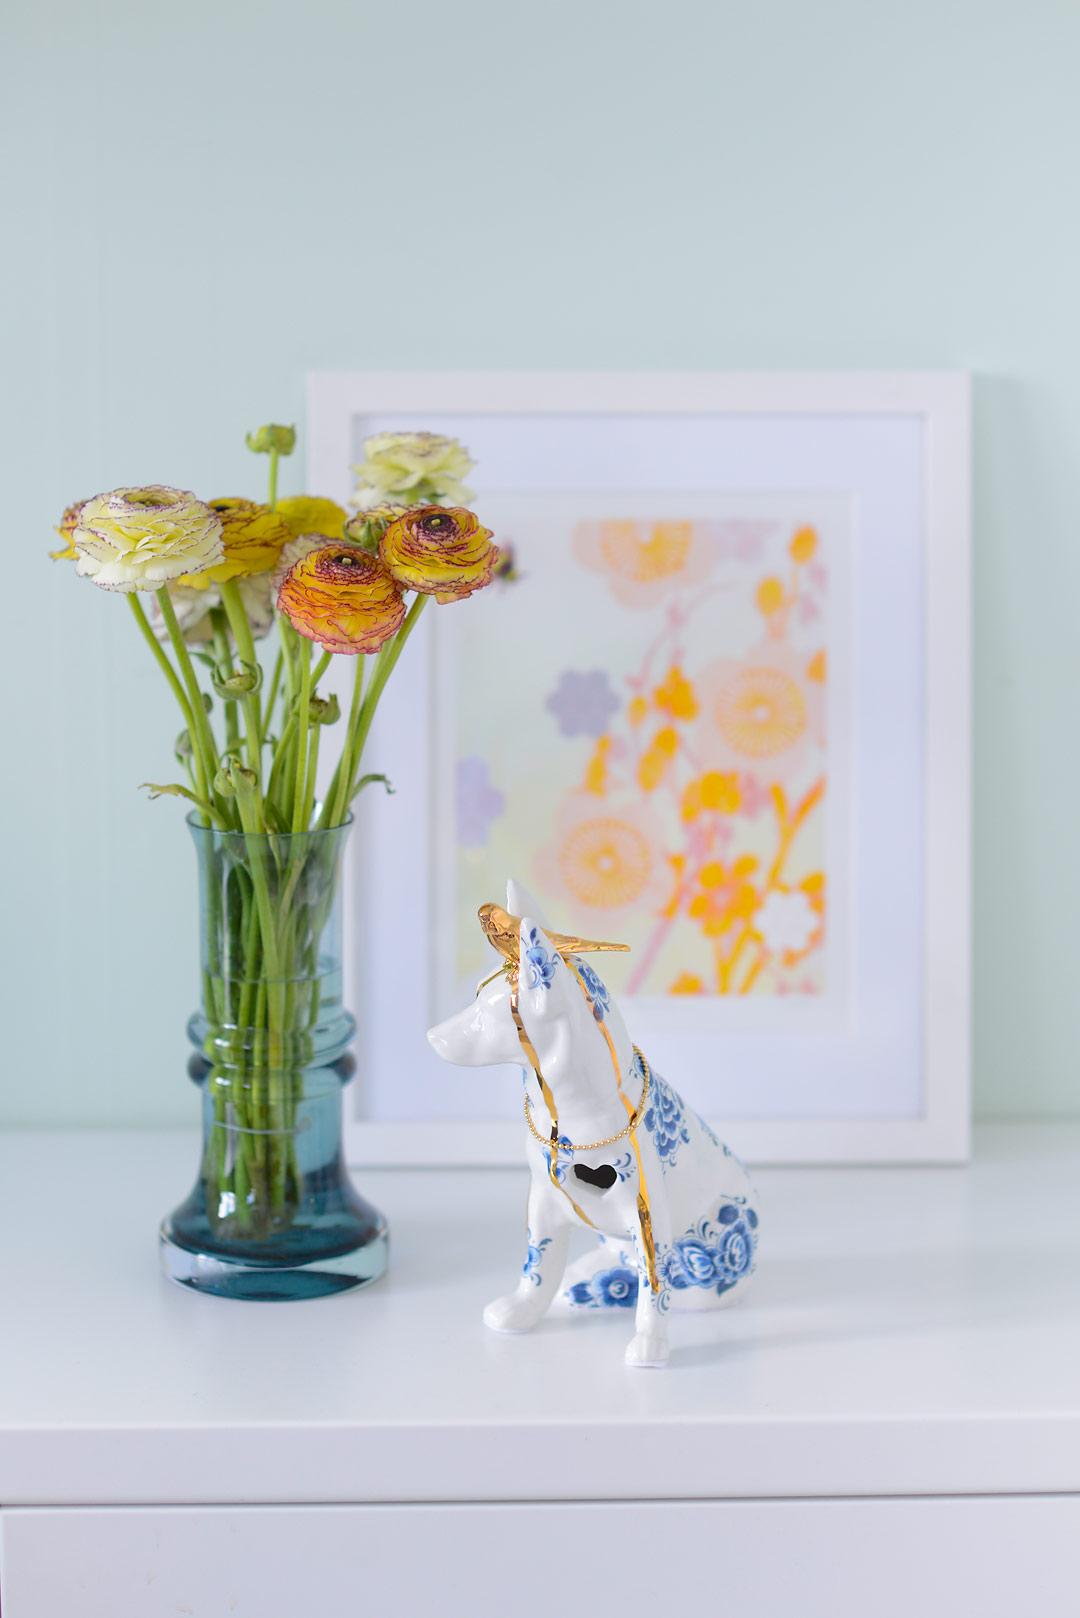 Ranunculus, Lammern en Lammers dog ant art print by Hadley Hutton